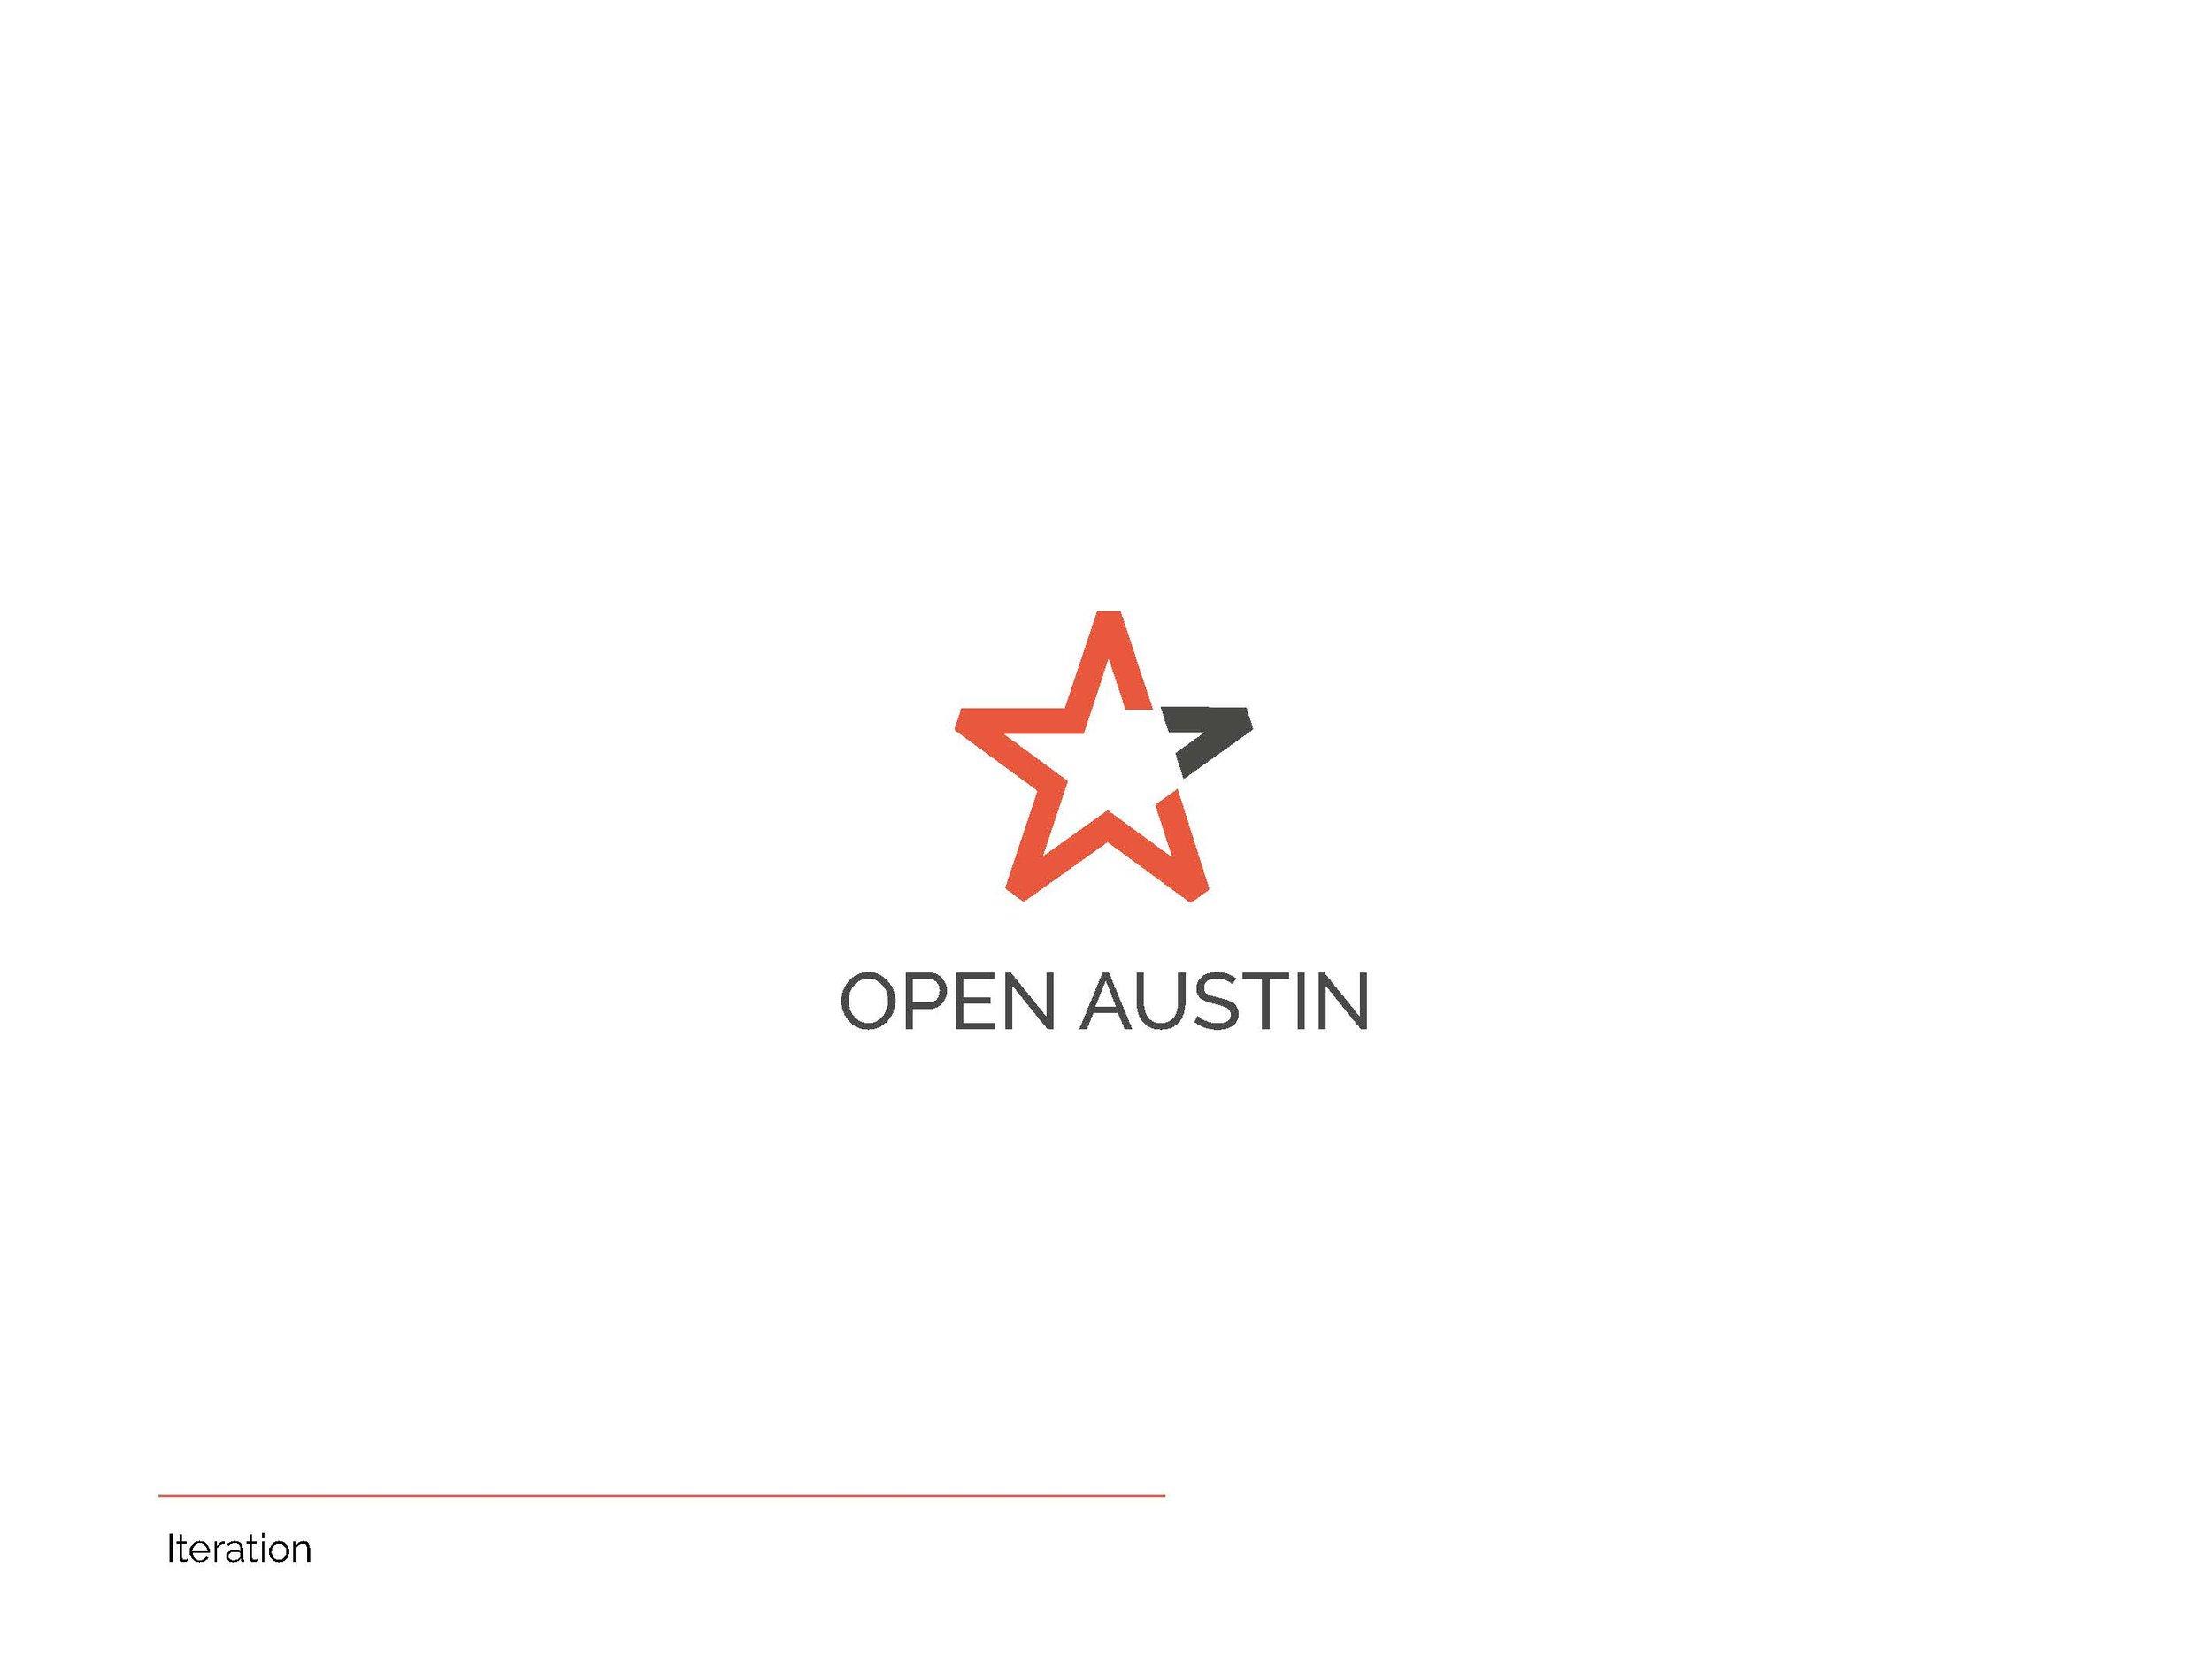 openaustinlogopresentation-160116162033_Page_12.jpg